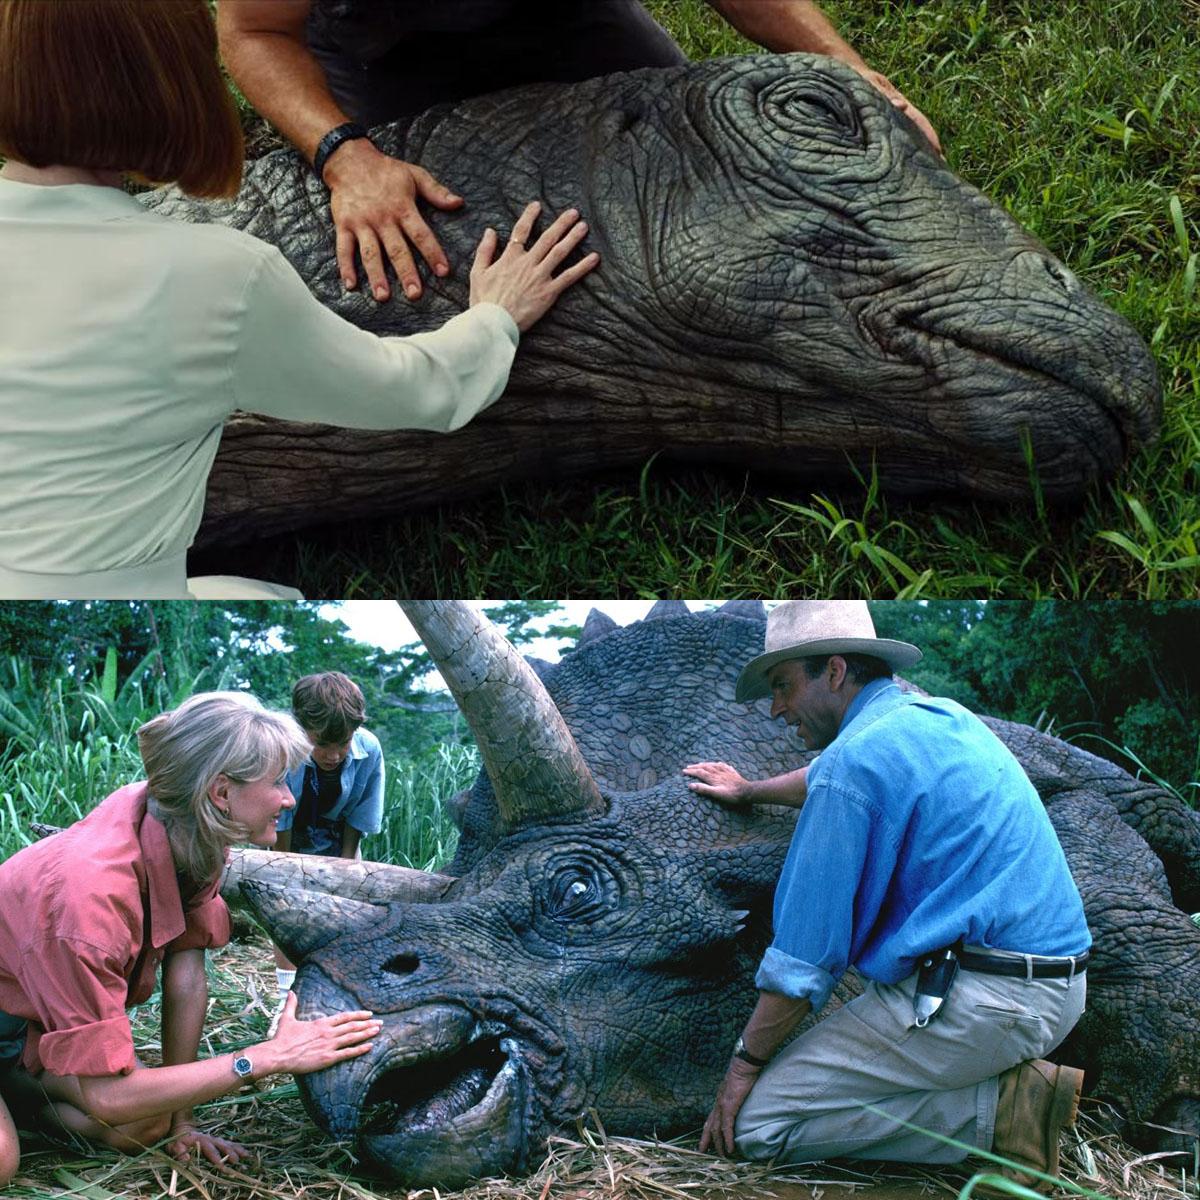 Jurassic world super bowl trailer 9 easter eggs and references to original films - Film de dinosaure jurassic park ...